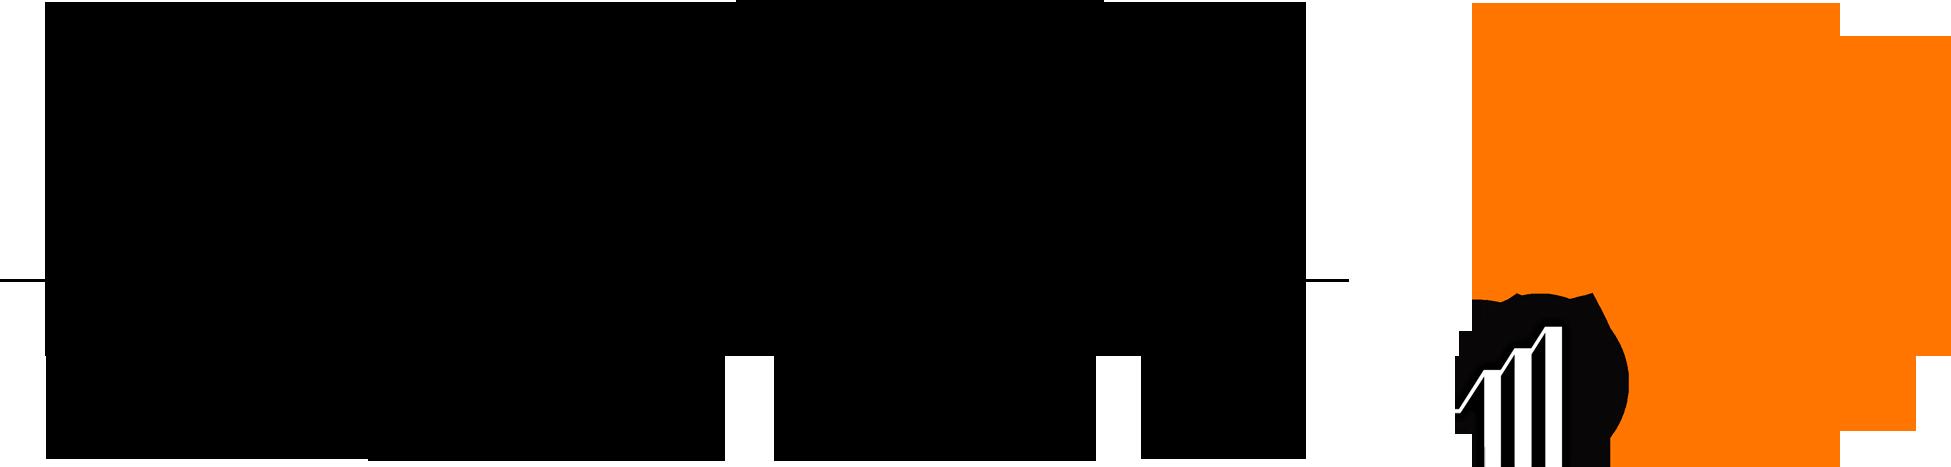 http://www.venturecup.dk/build/wp-content/uploads/2014/12/Mentor-Program.png